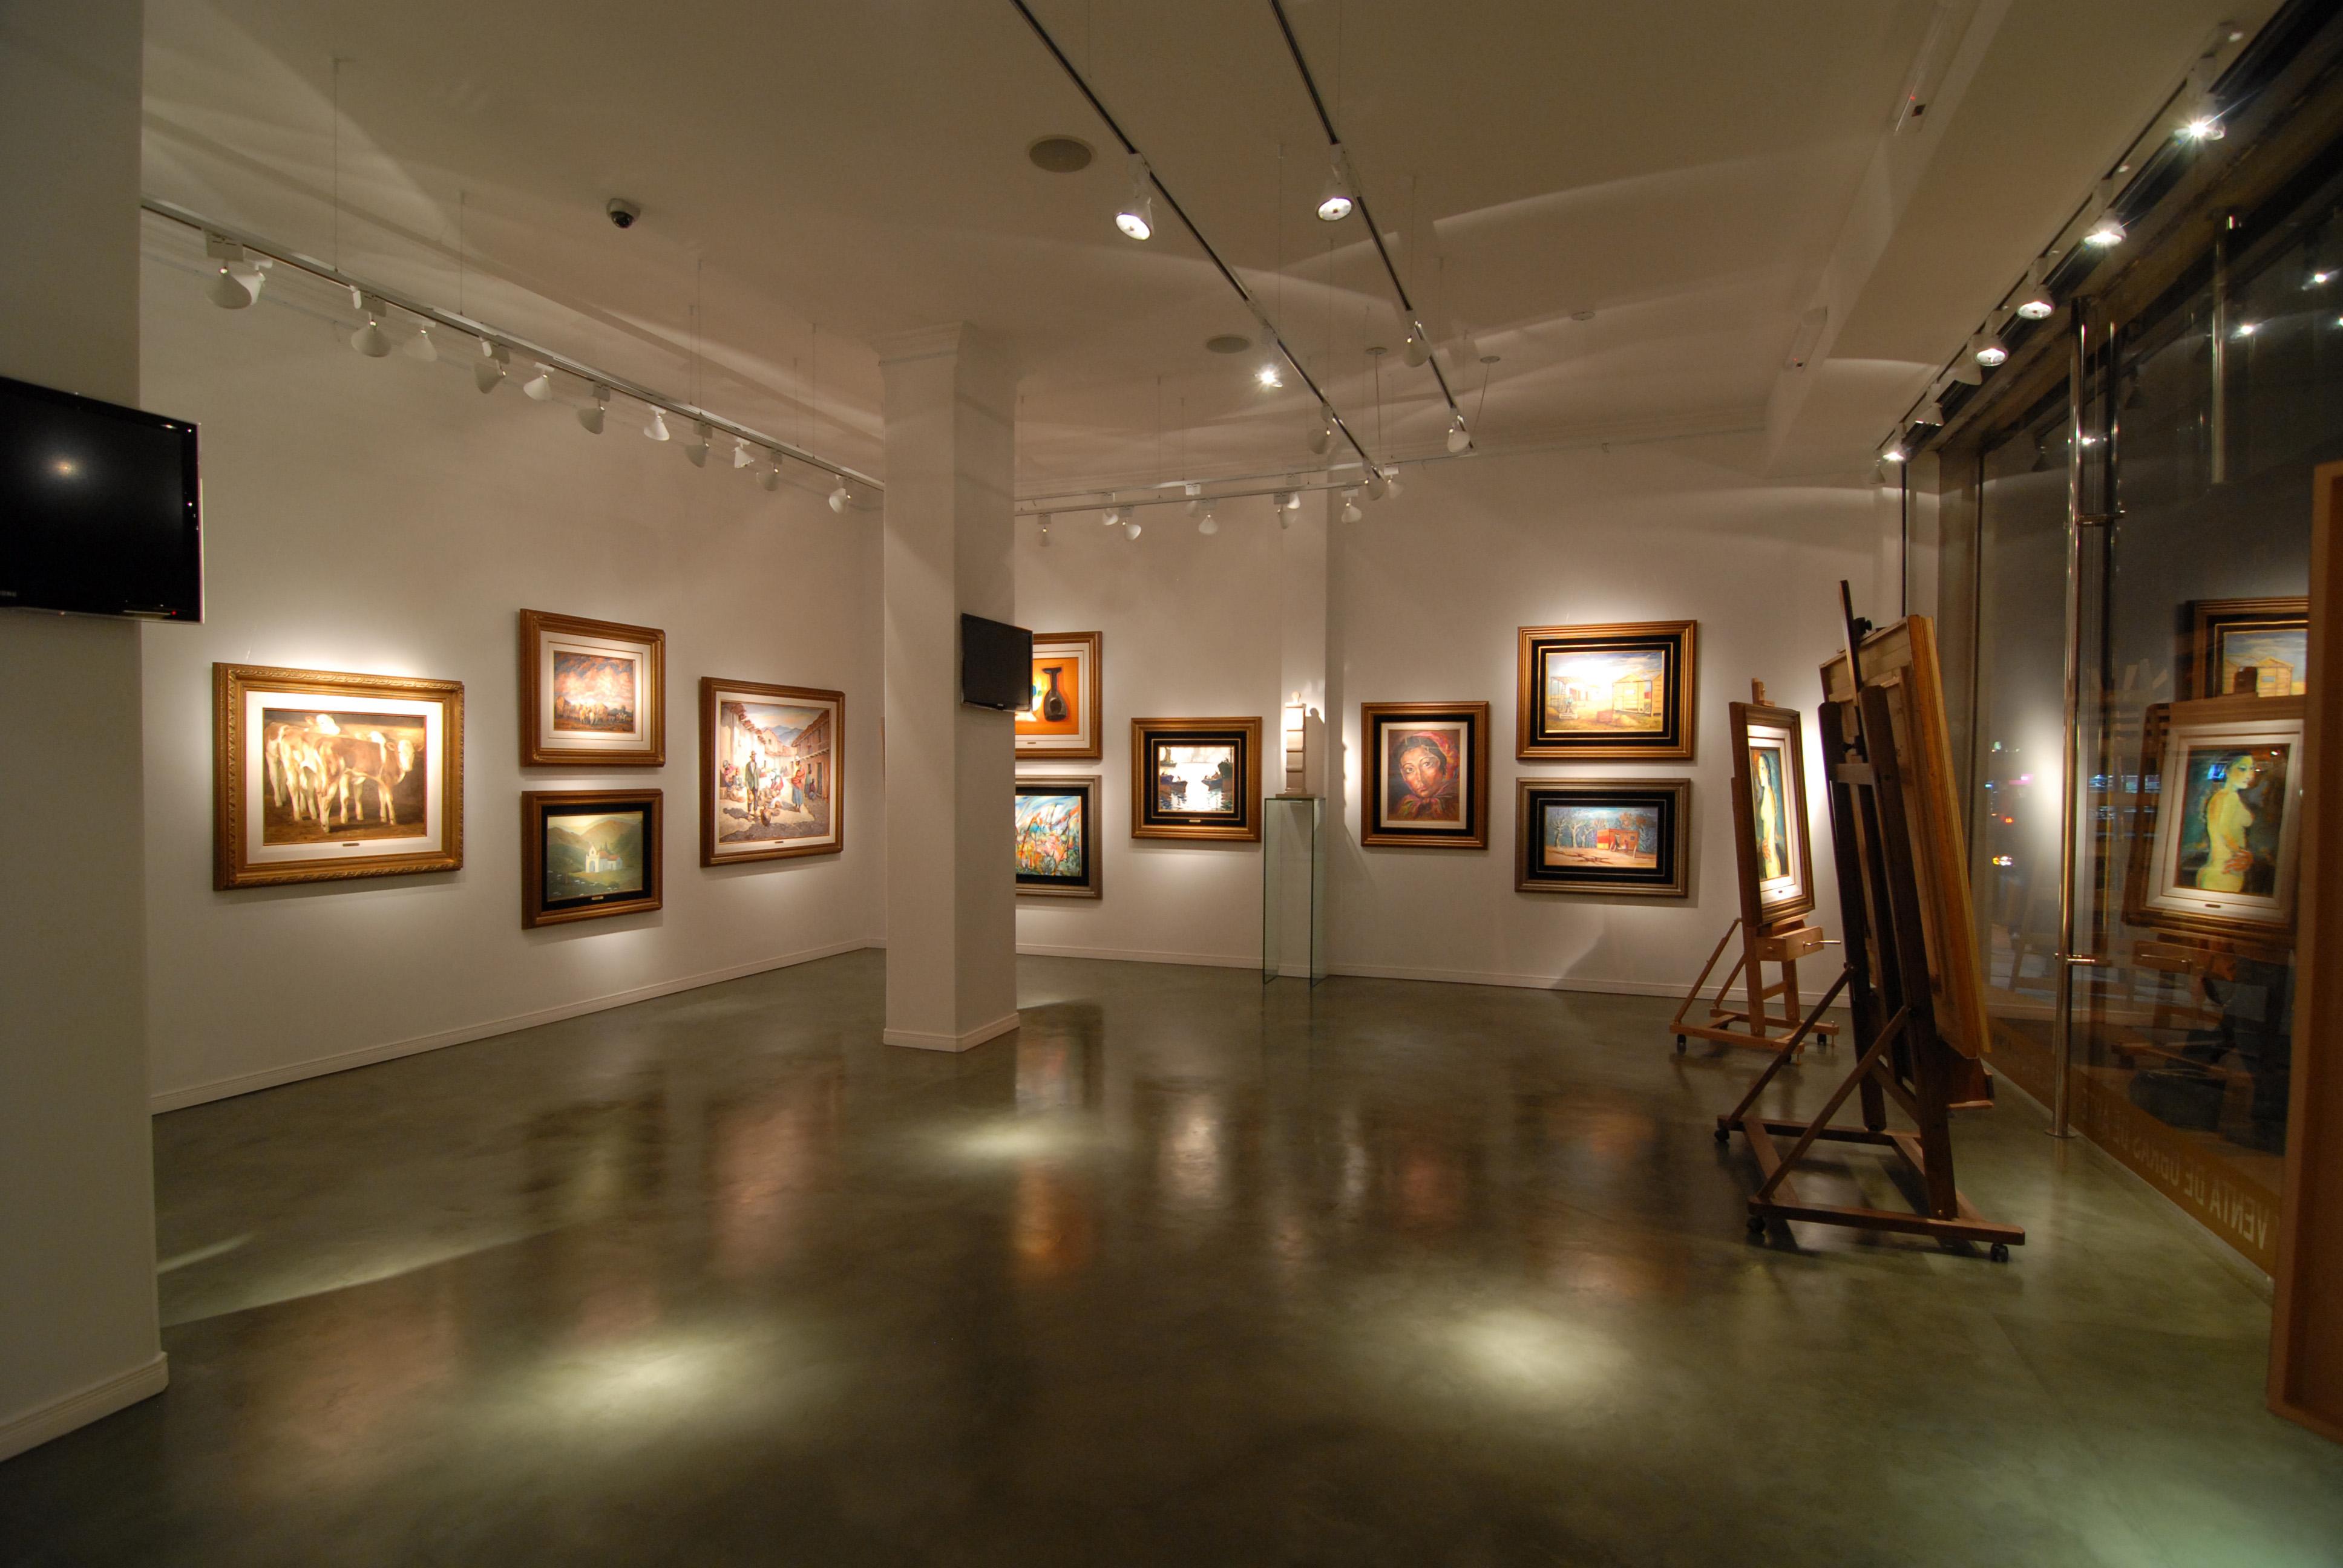 Galeria de artes pintura en leopintura en leo - Galeria de arte sorolla ...